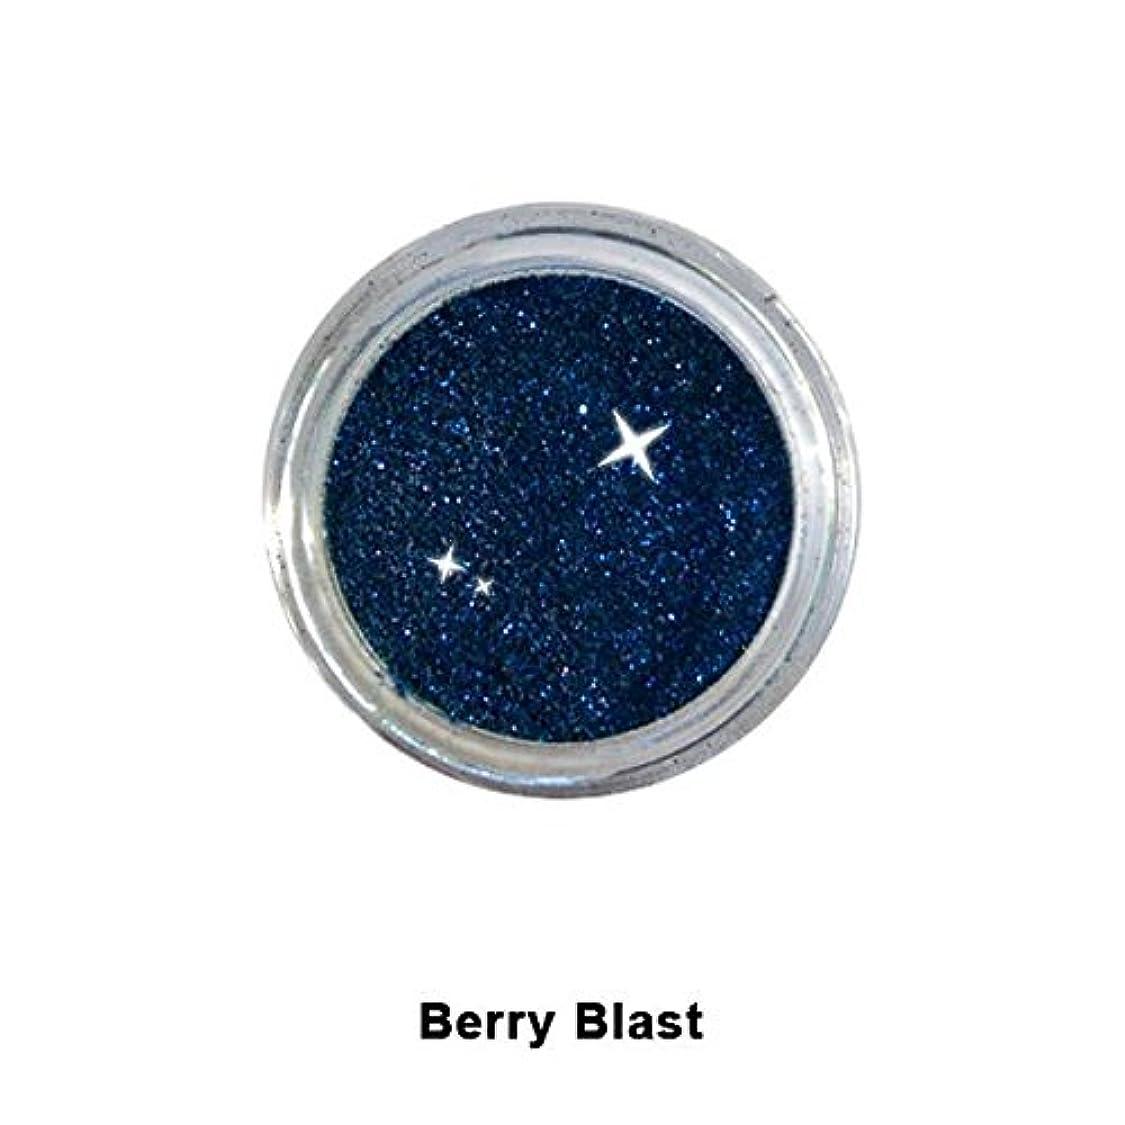 Eye Kandy アイキャンディー グリッター メイクアップ アイシャドー アイライン Glitter Sprinkles 5個以上購入でキャンディセット(リキッドシュガー?筆)プレゼント (Berry Blast)